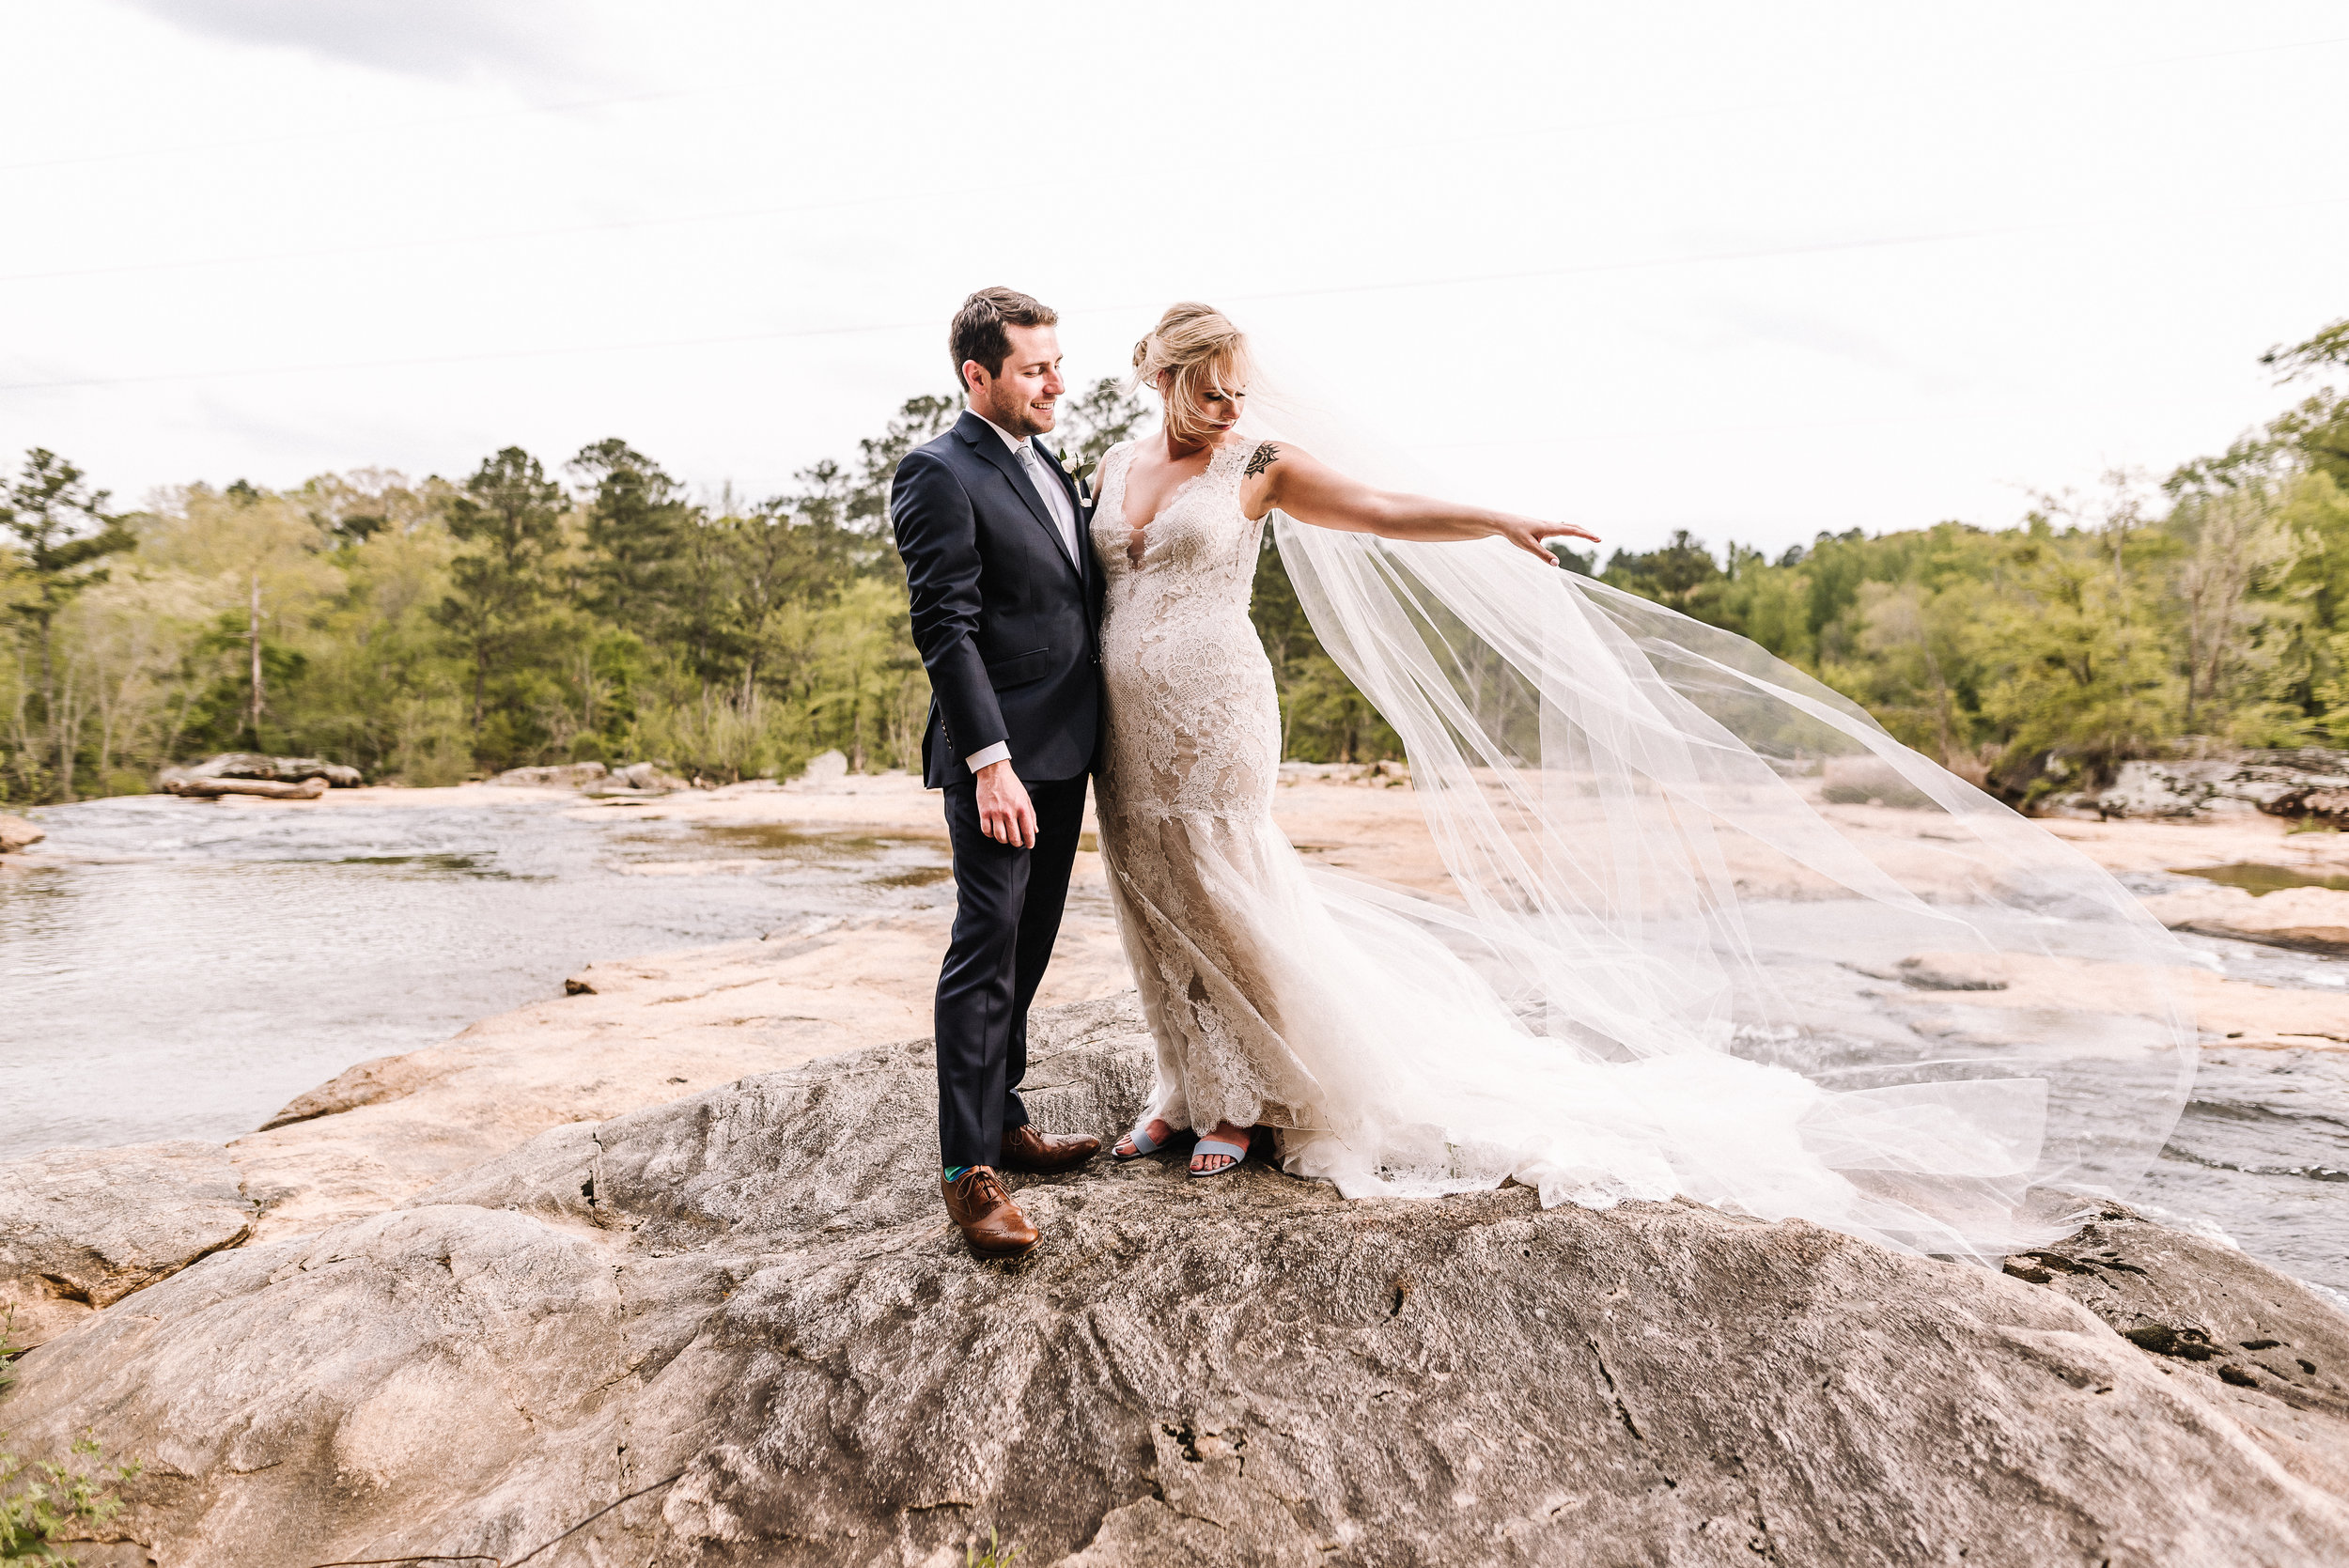 Morgan Wedding_Mill at Yellow River_Ashley Benham Photography-877.jpg